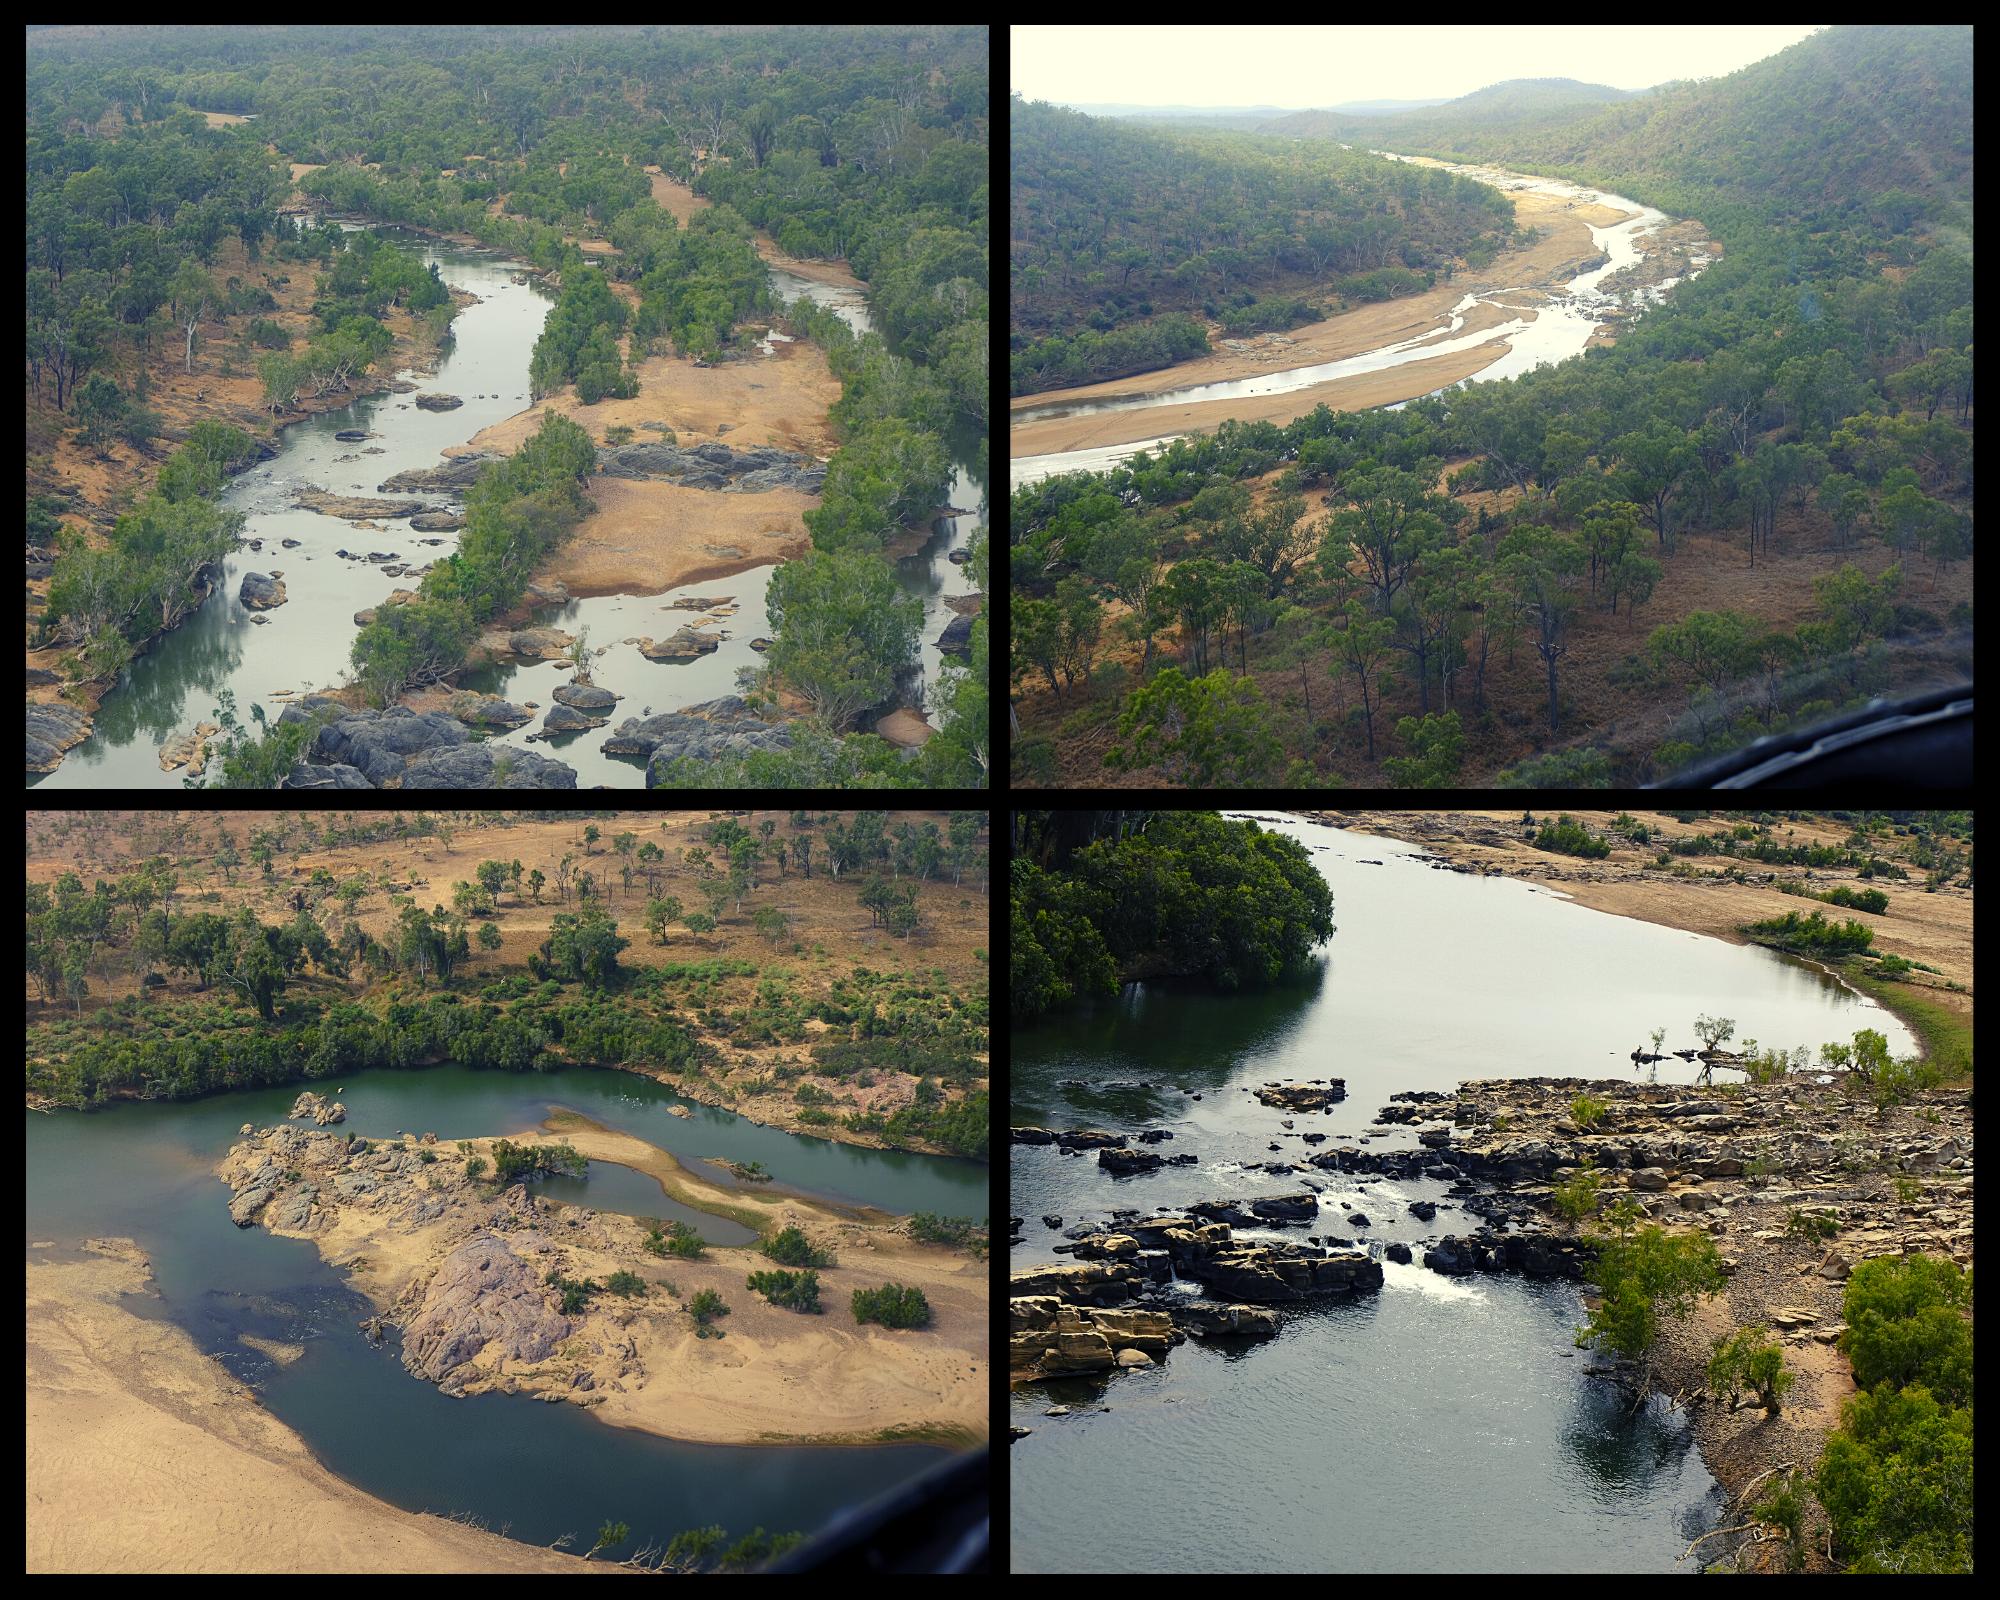 Burdekin River from above